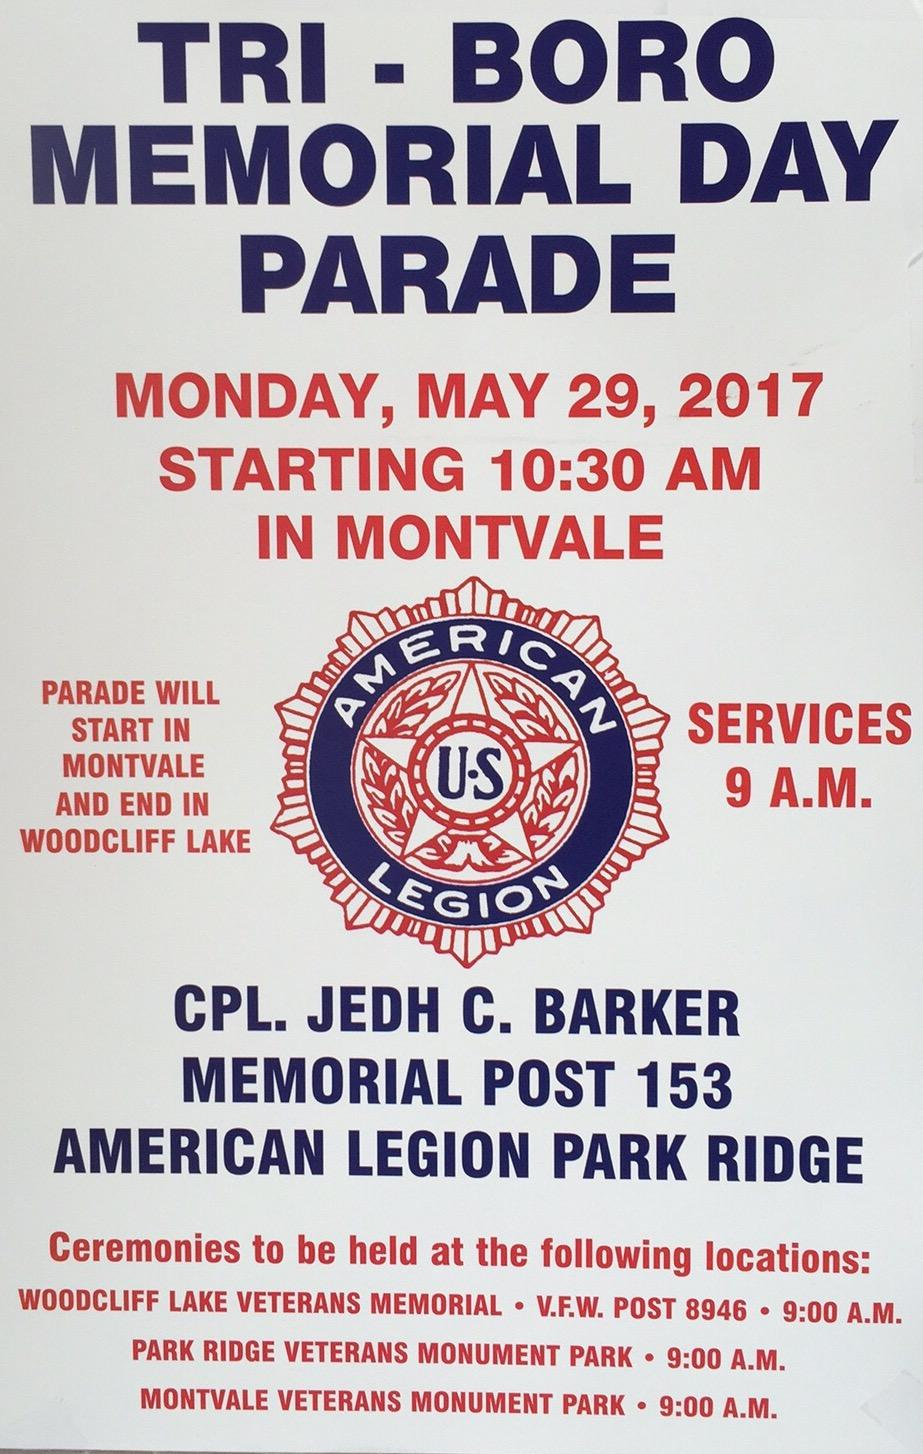 Memorial Day Parade Invitational